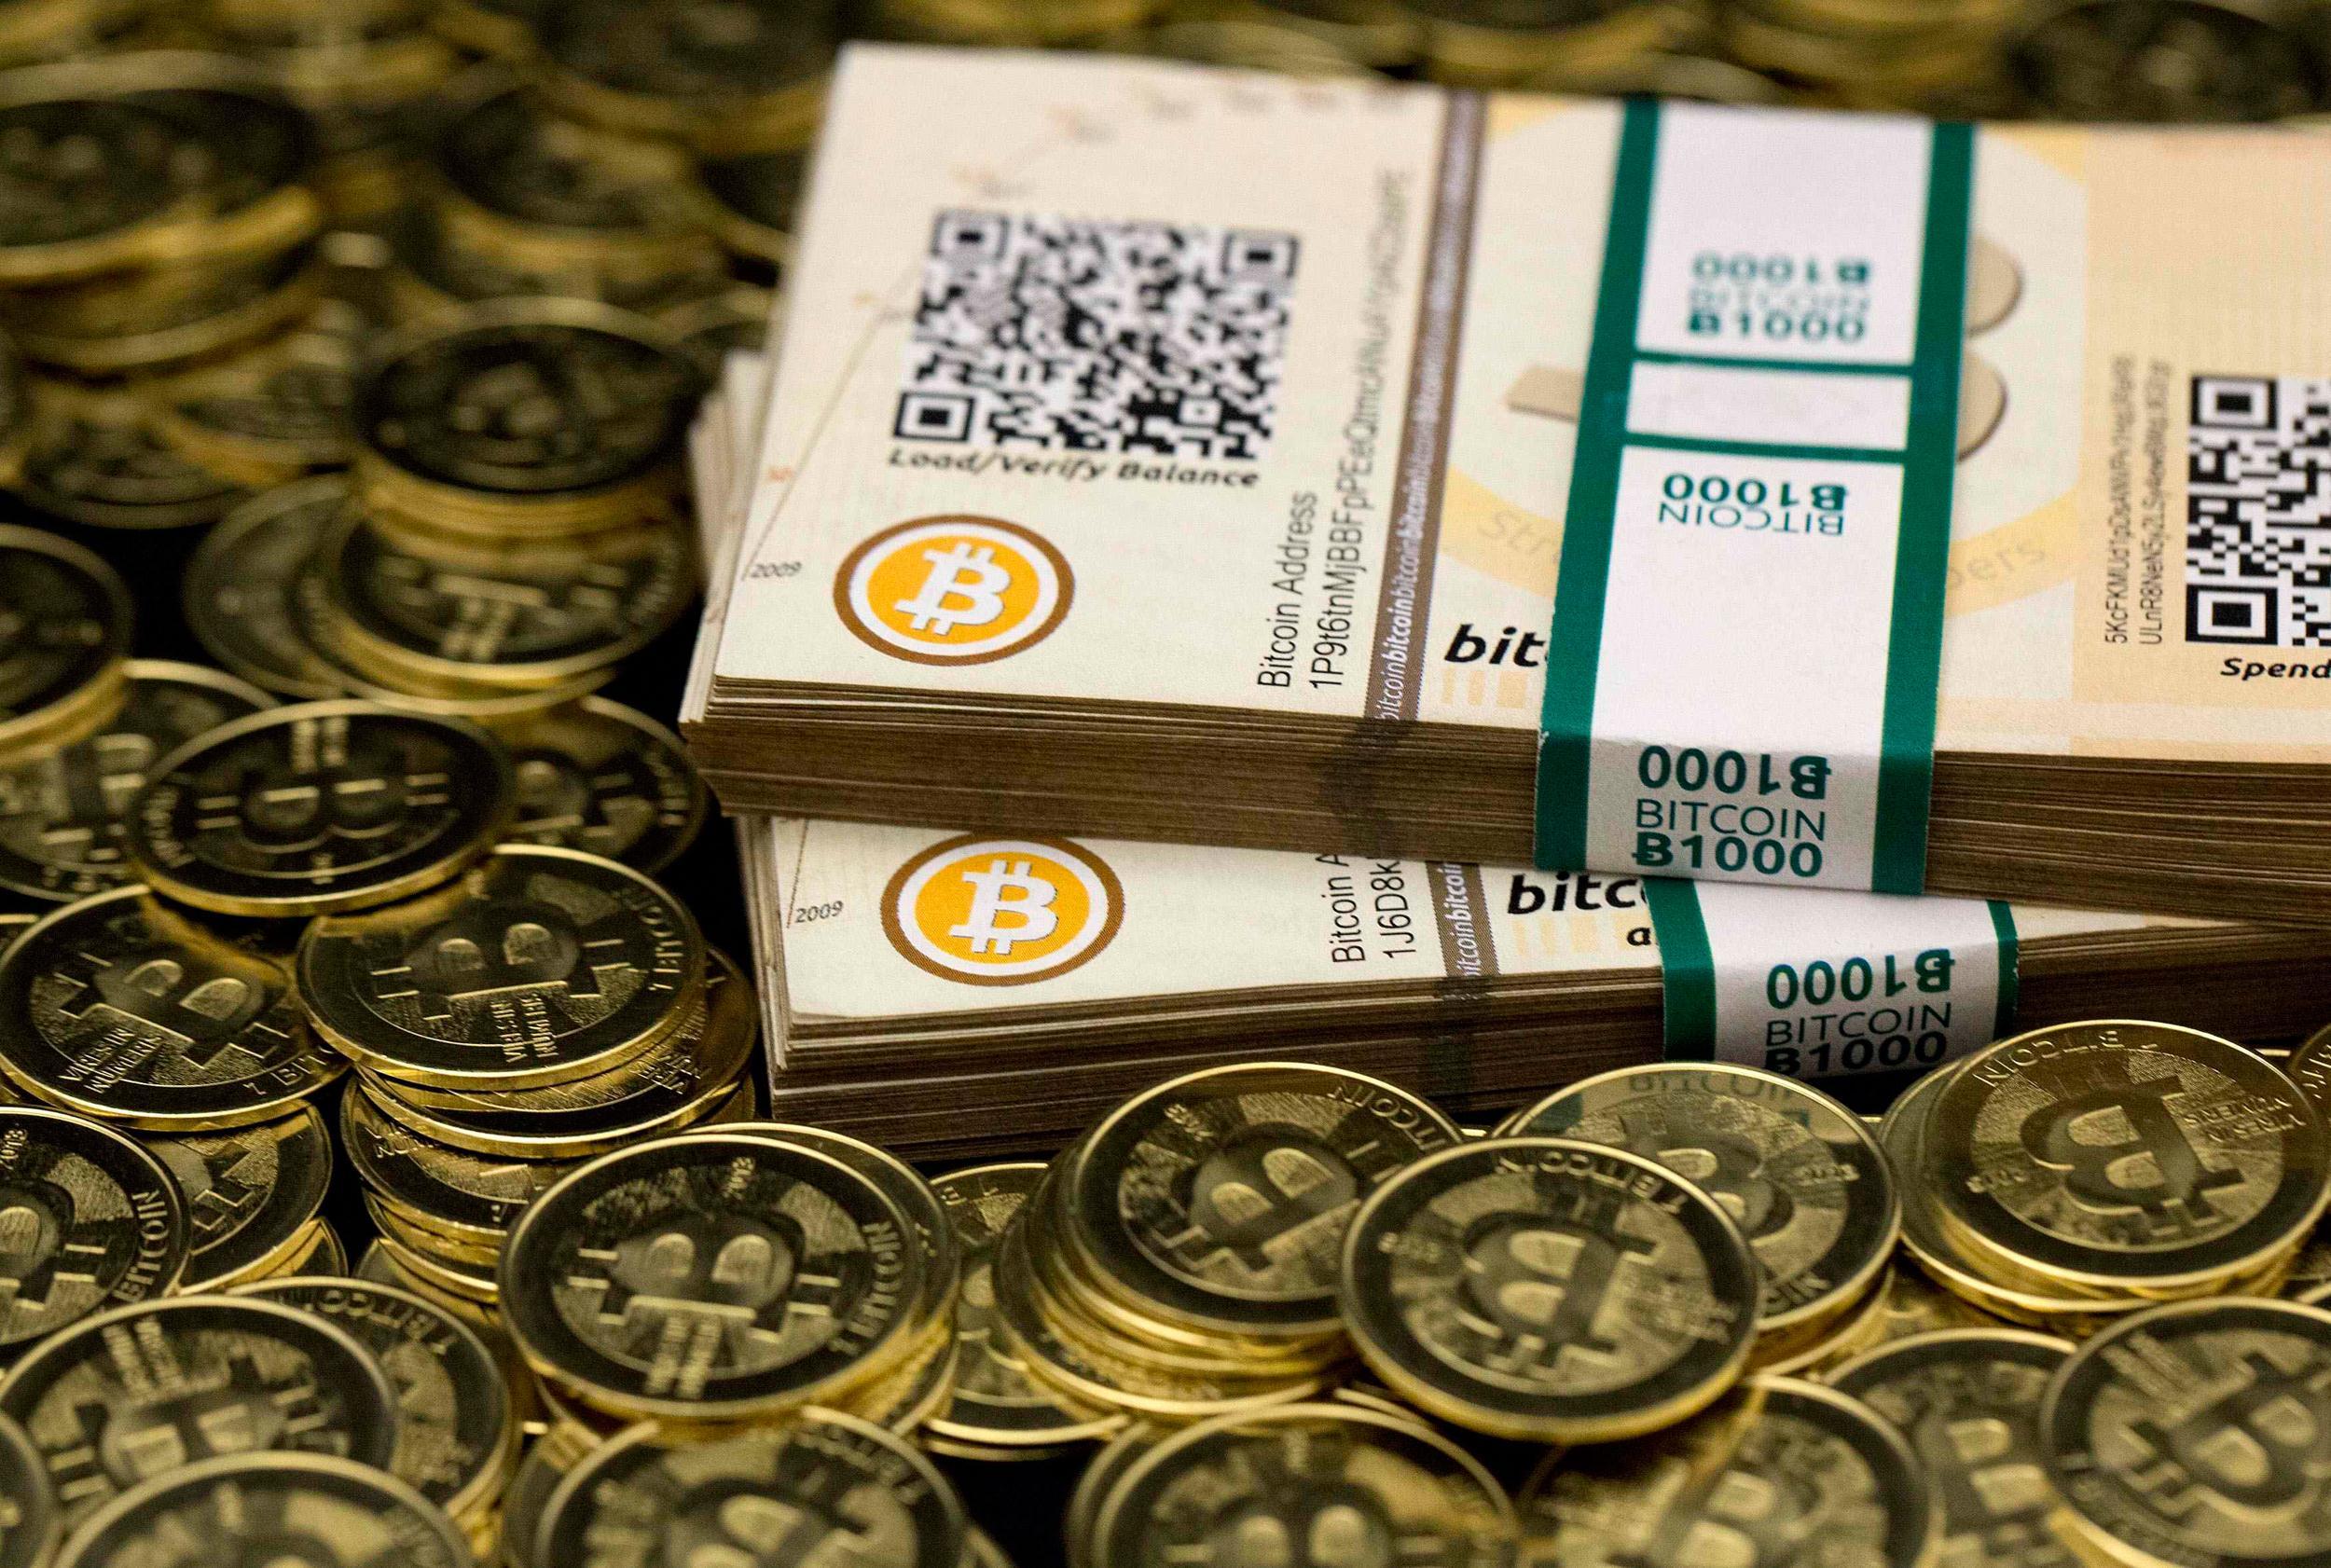 140225-bitcoin-330a_d1d1c60151a024535f0ccdcb1bf84f02